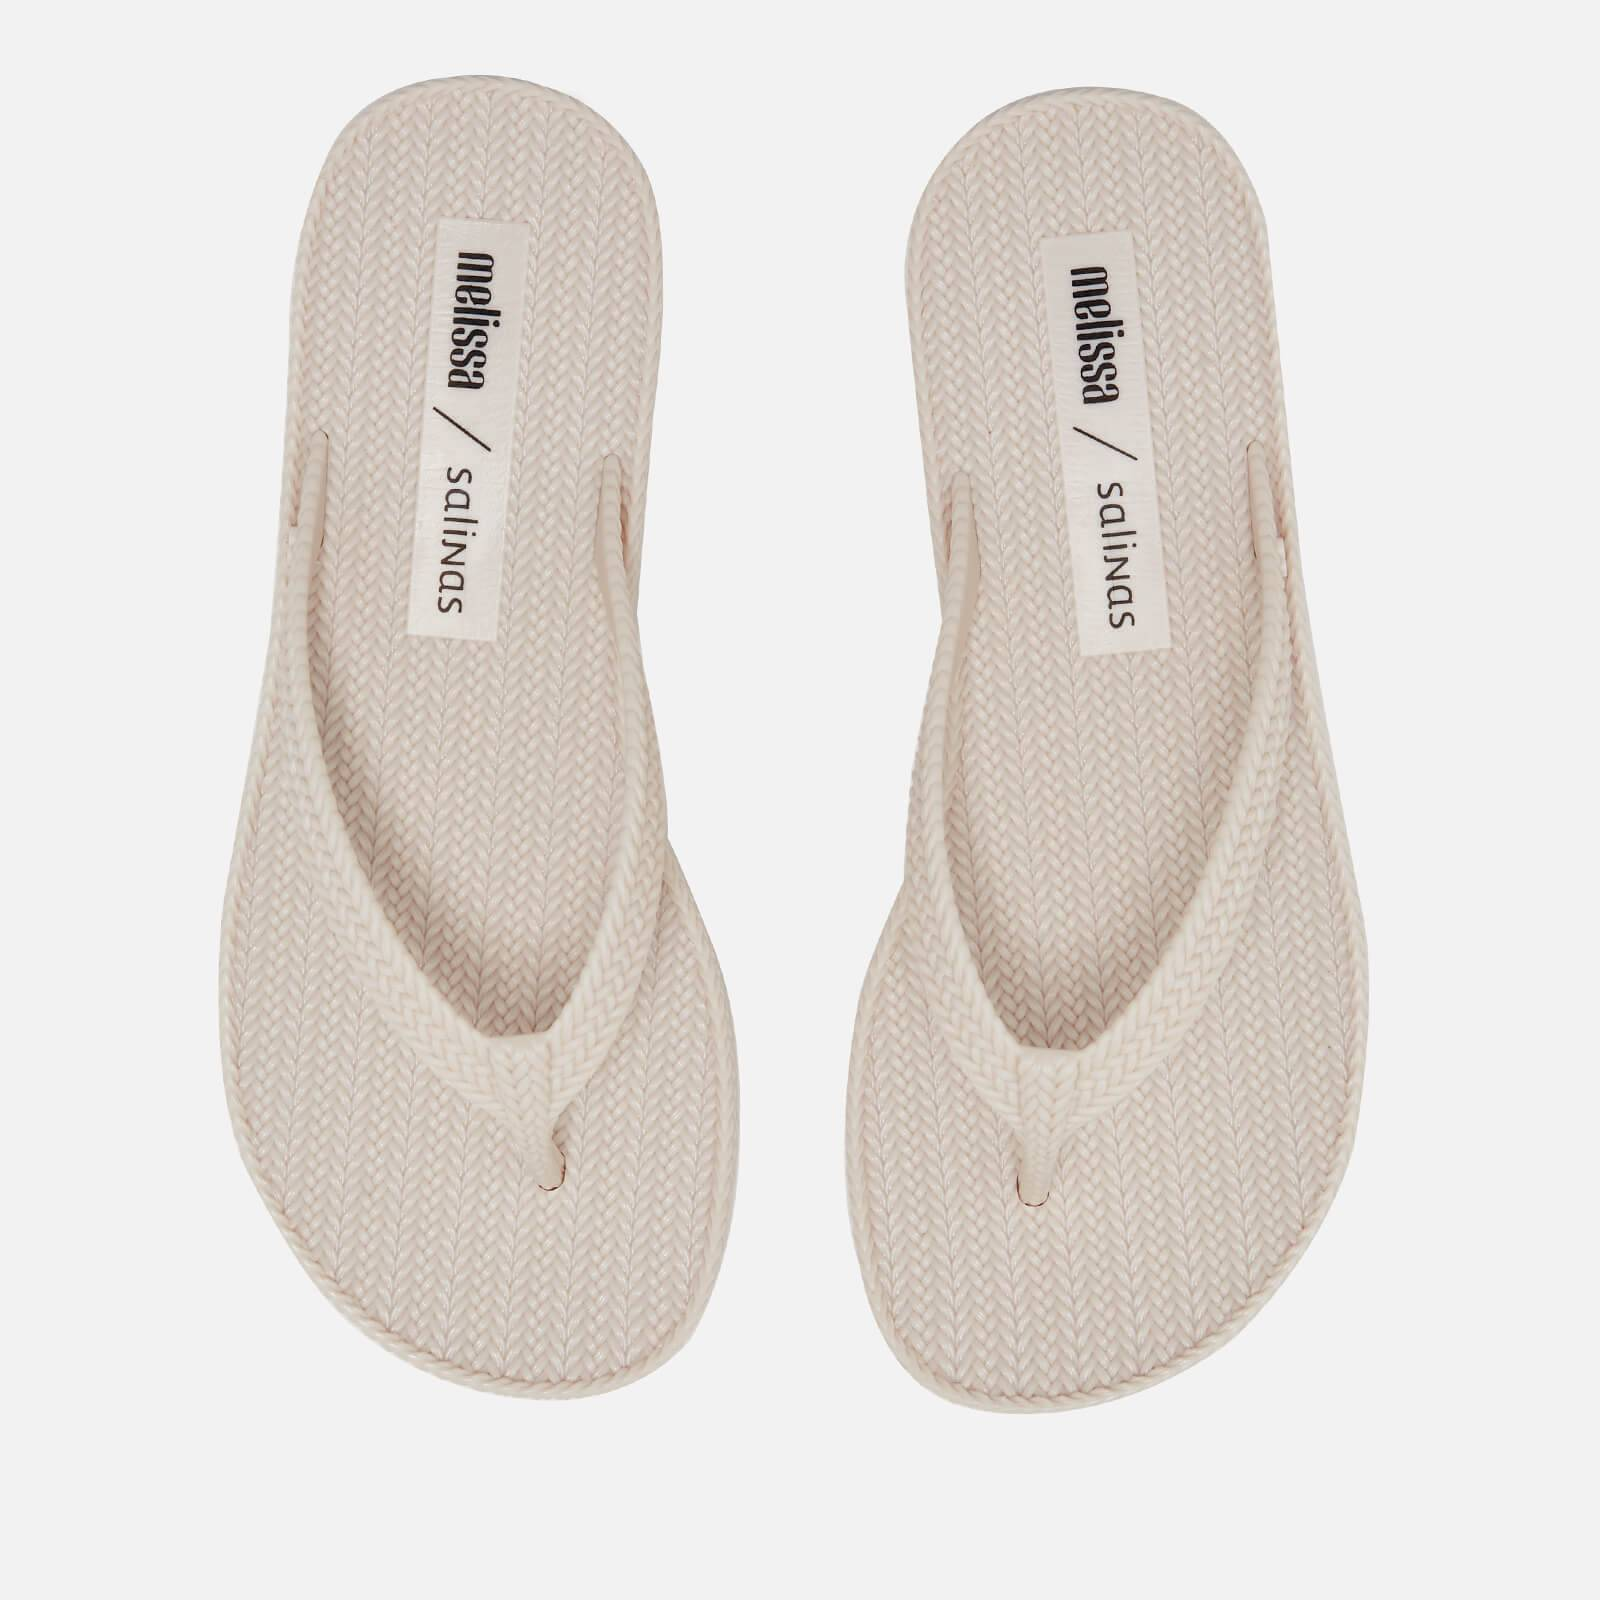 Melissa Women's Salinas Summer Braid Flip Flops - Ivory - UK 4 - White